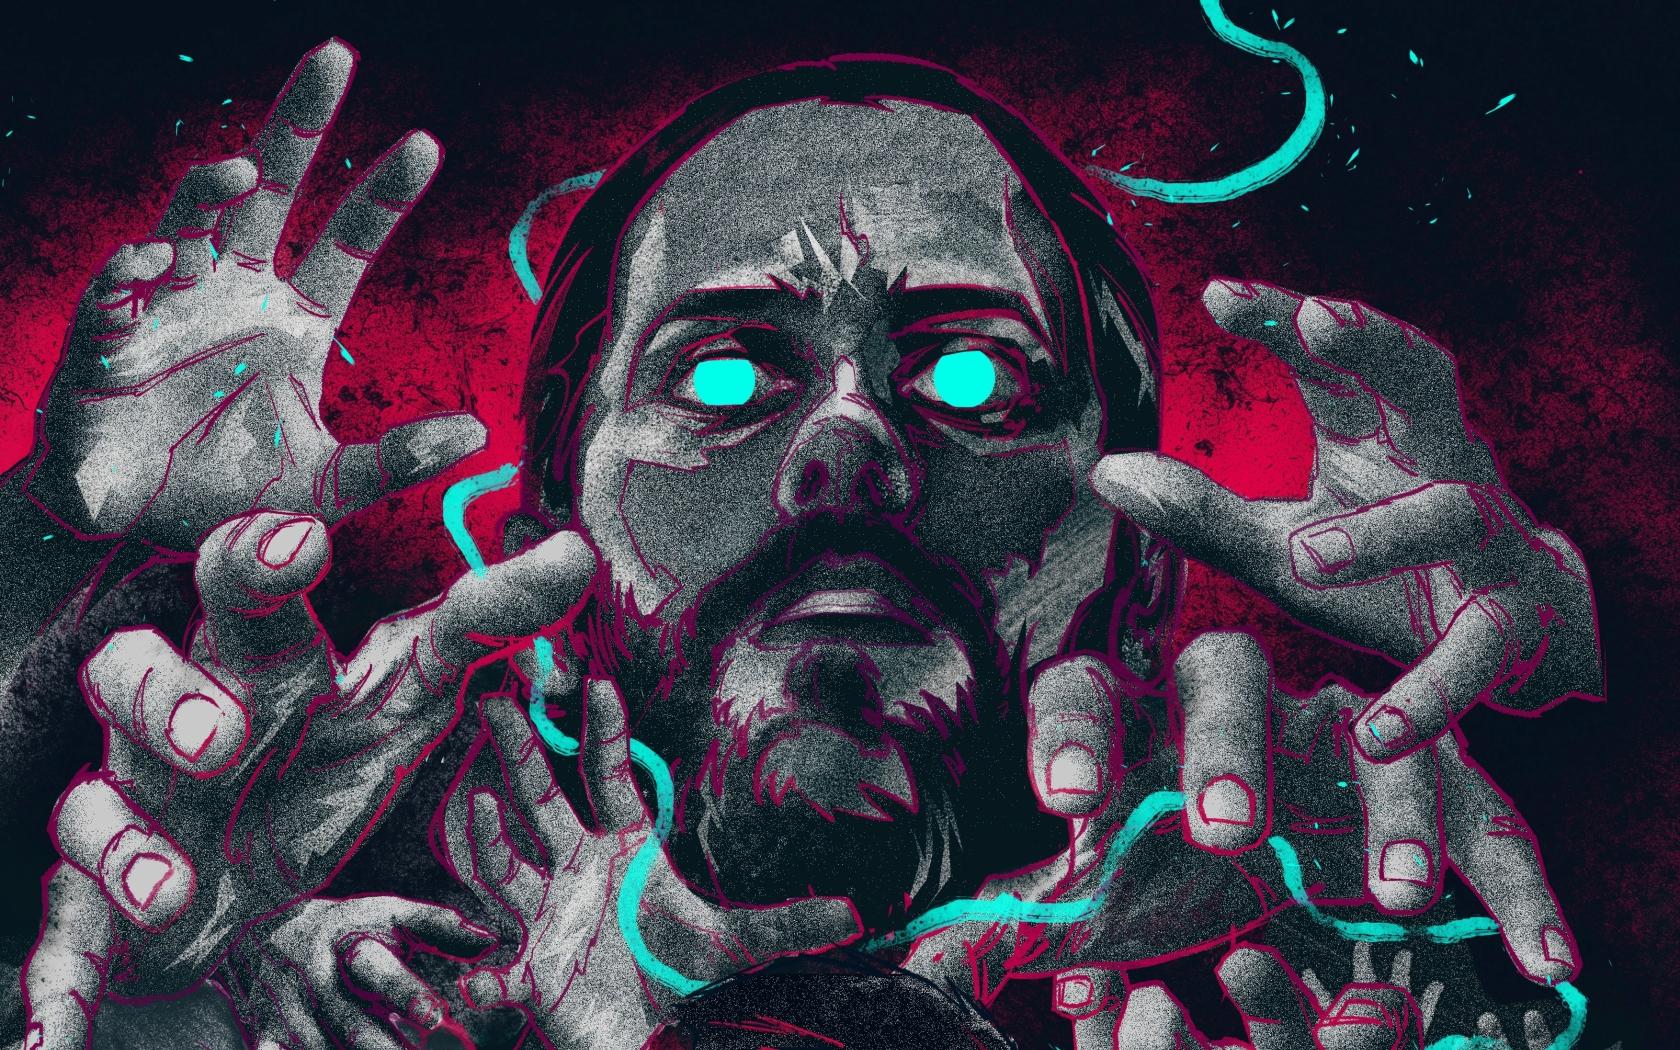 Niander Wallace Blade Runner 2049 Poster Fanart Hd 4k